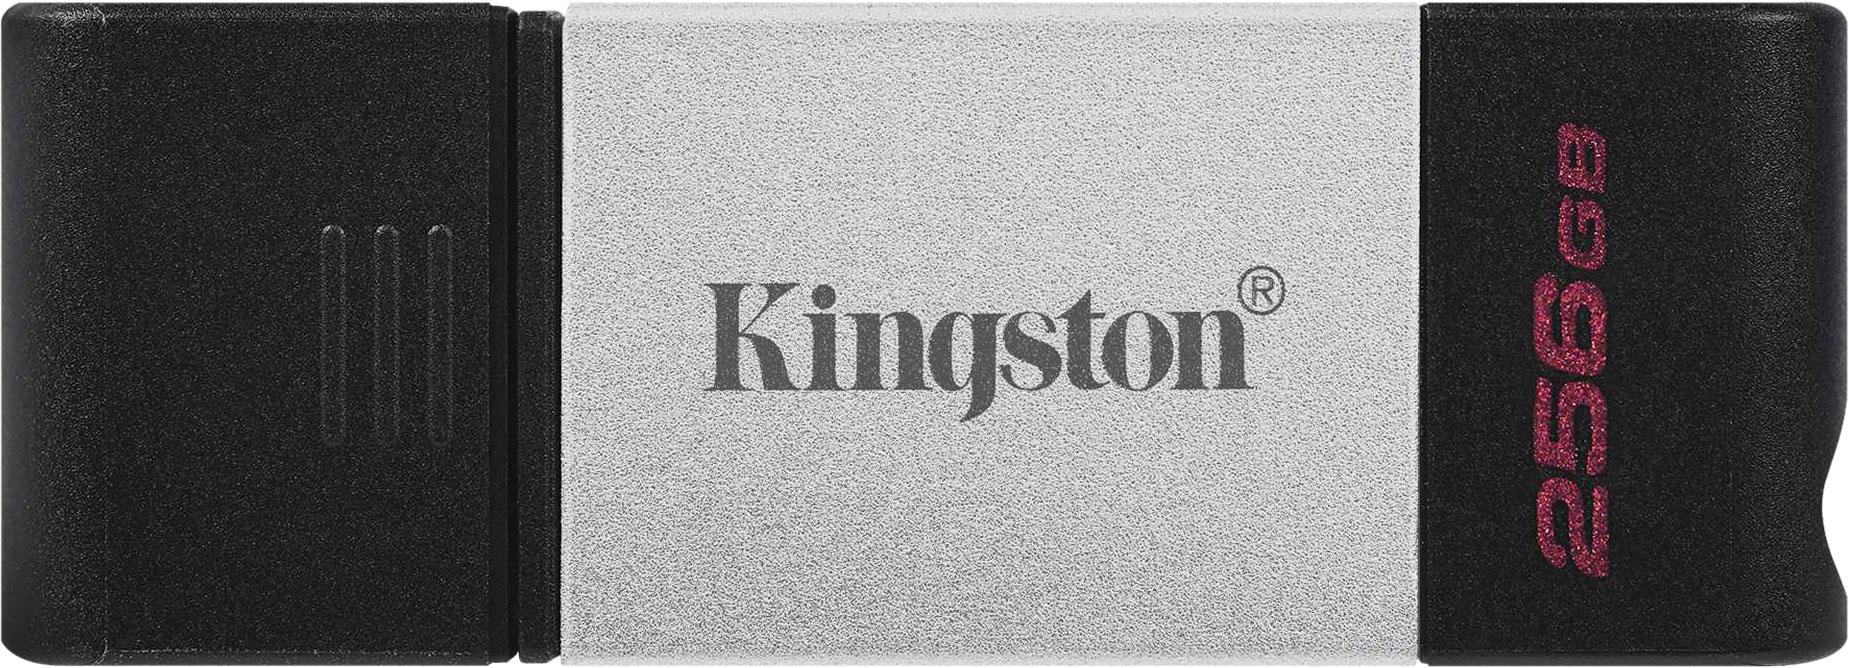 Флеш-накопитель Kingston DataTraveler 80 OTG USB Type-C, 256 ГБ